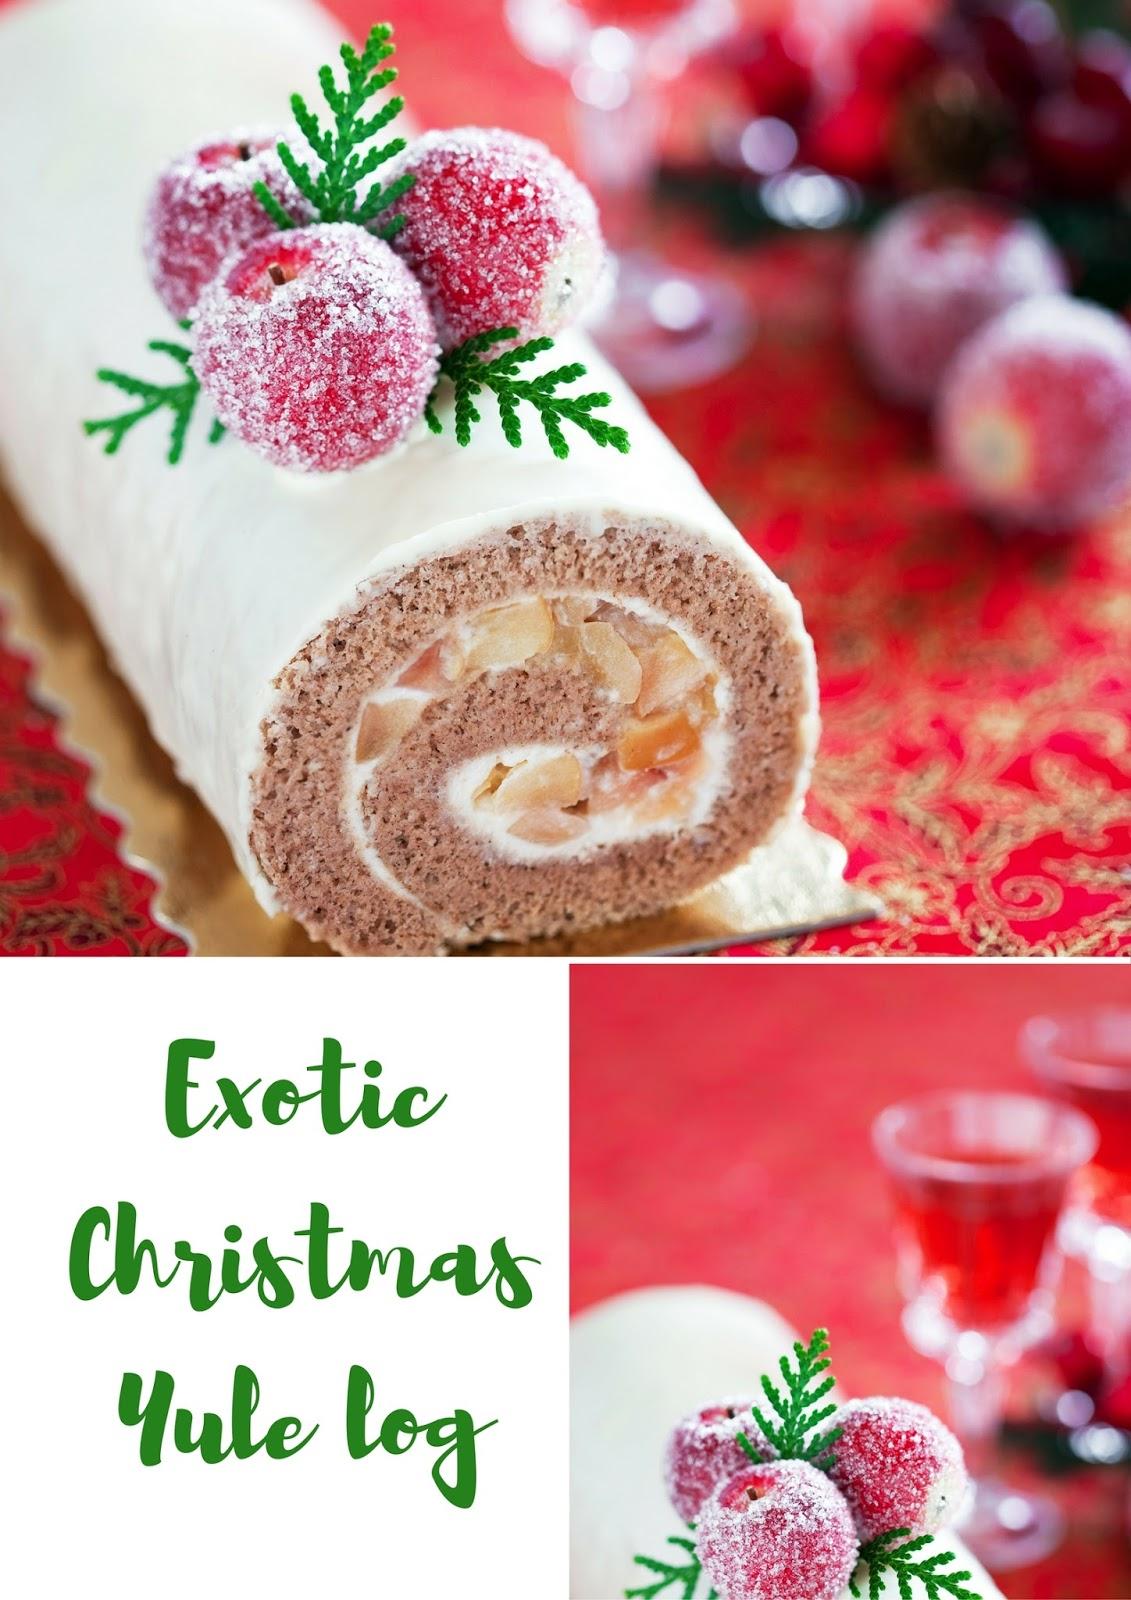 Exotic Christmas Yule Log